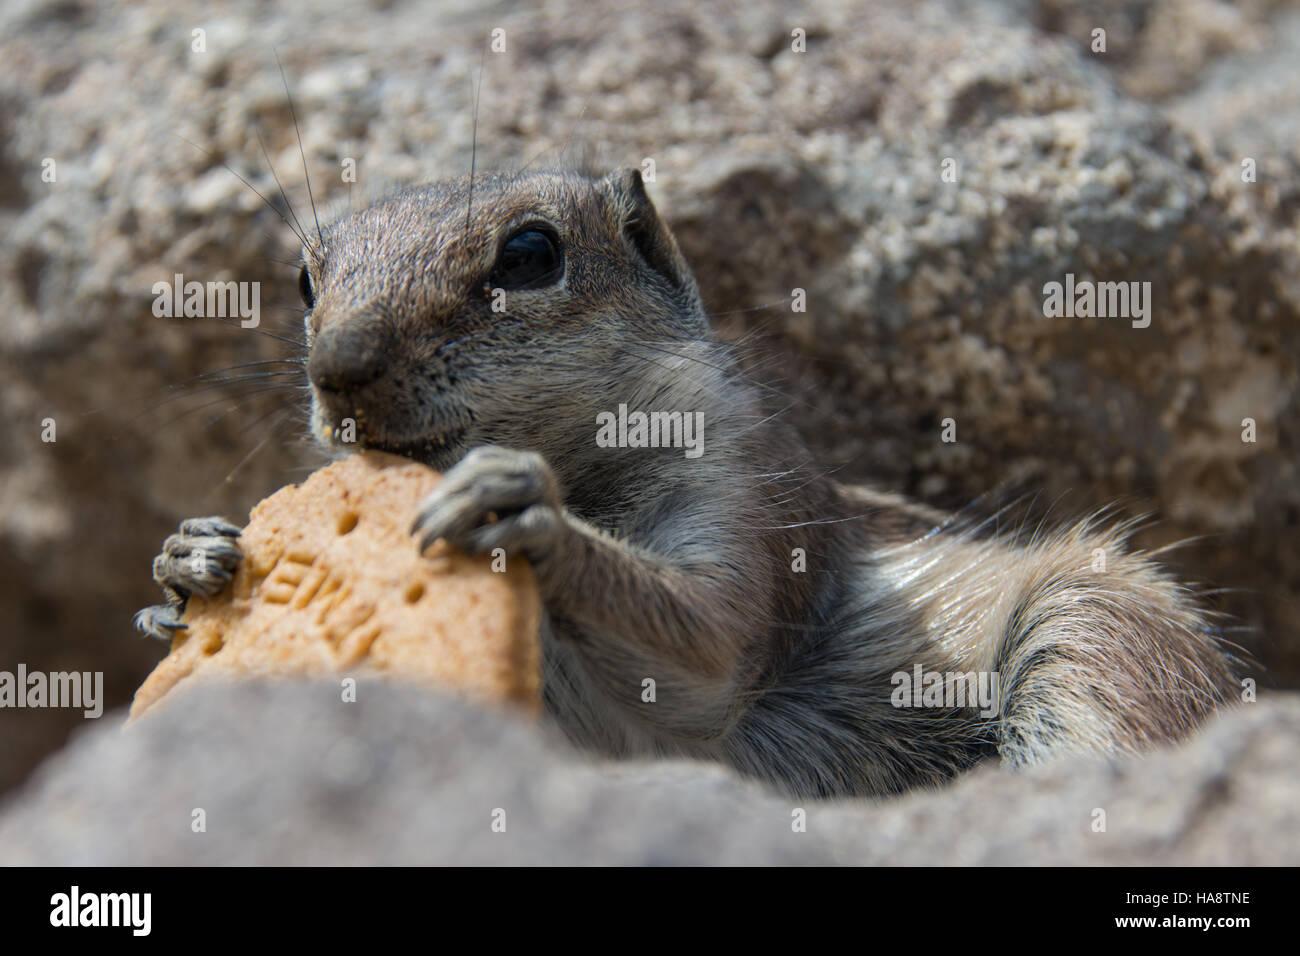 Squirrel, Fuerteventura, Canary Island - Stock Image